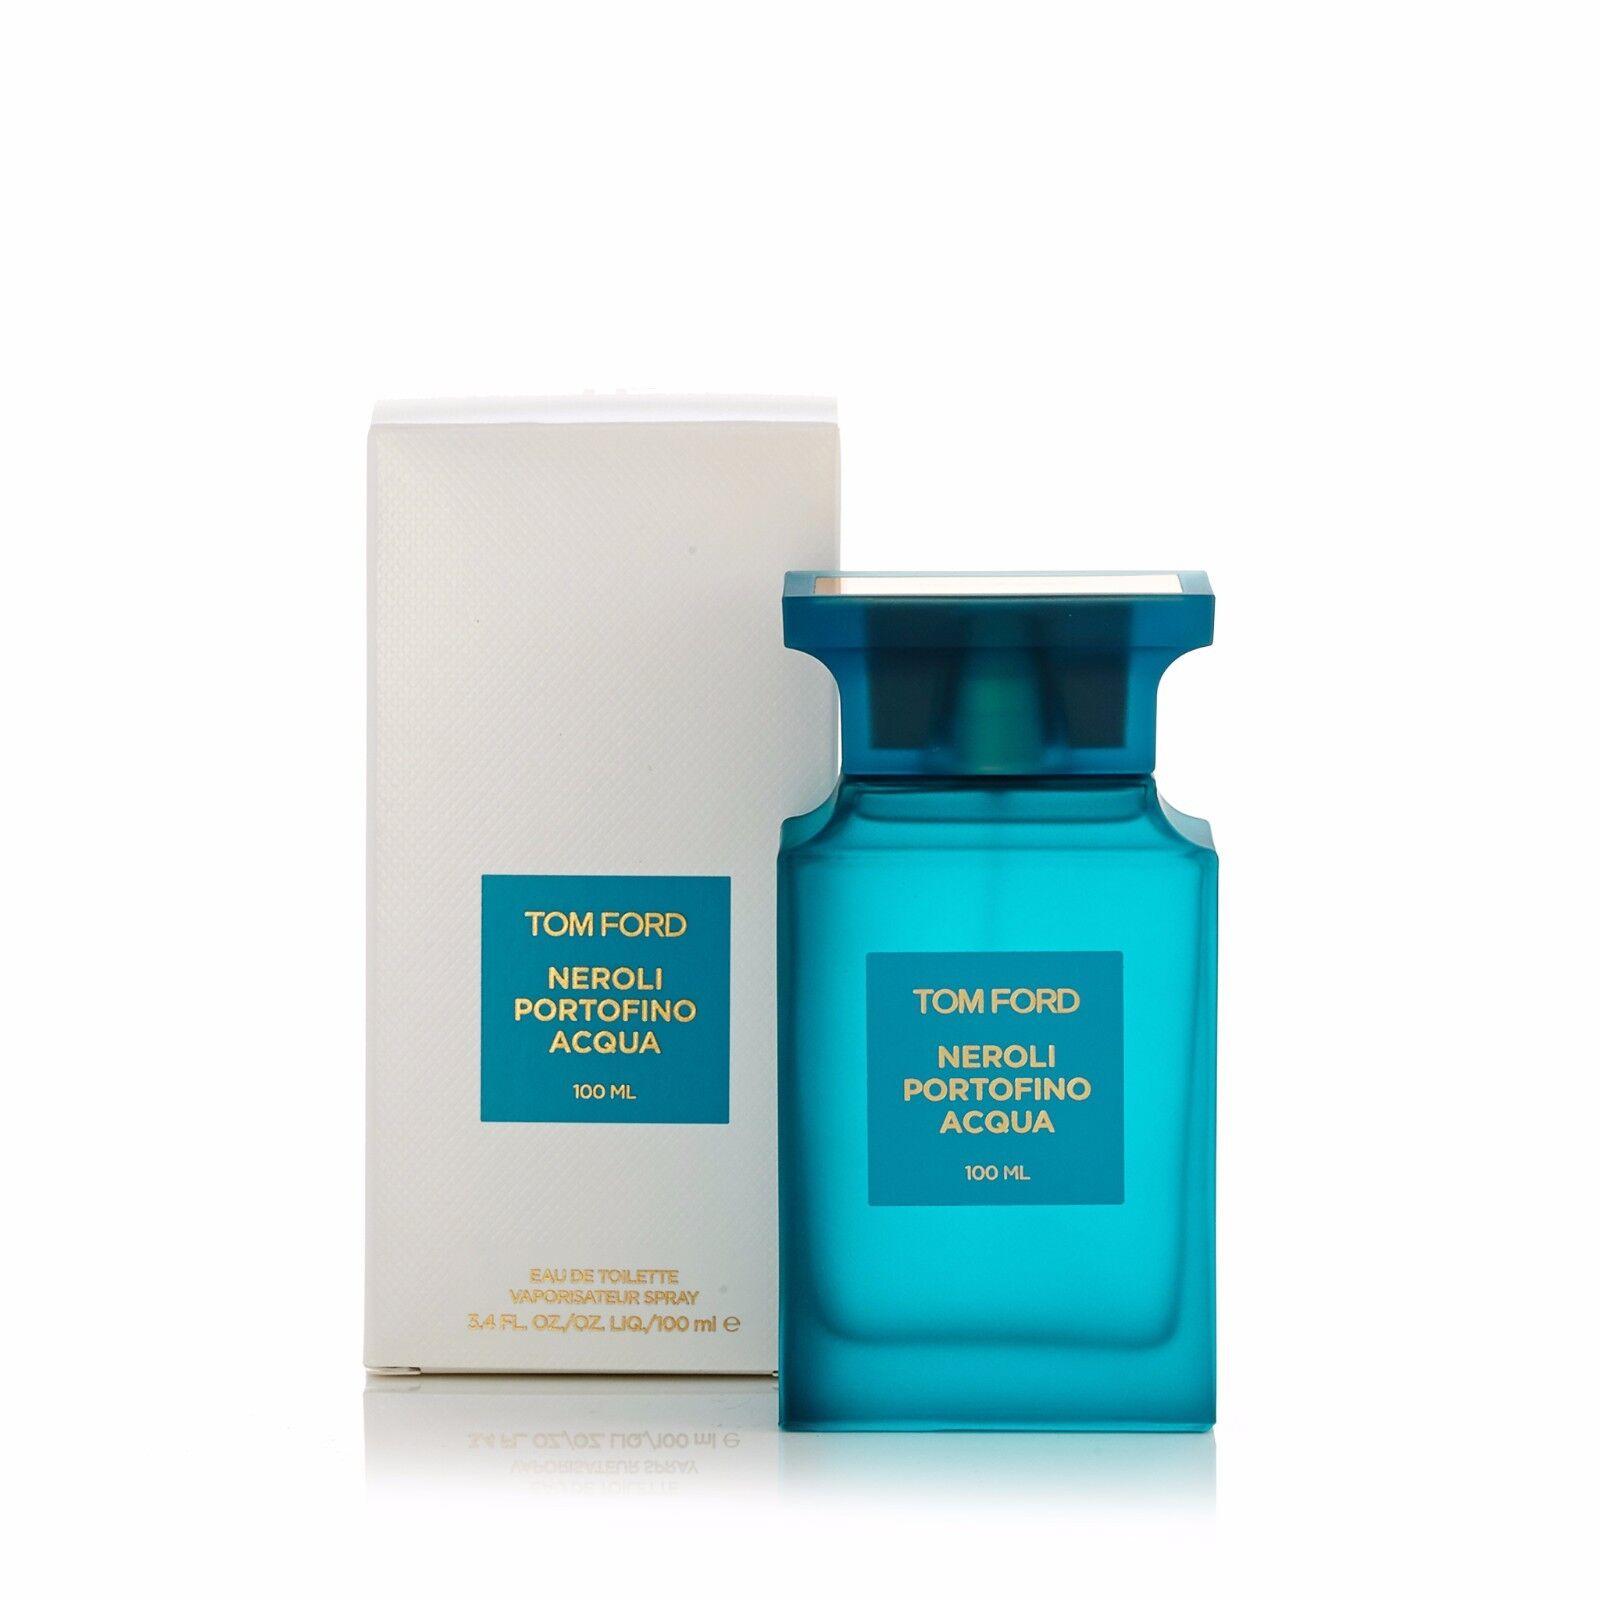 Neroli Portofino Acqua EDT Spray for Women and Men by Tom Ford 3.4 oz.